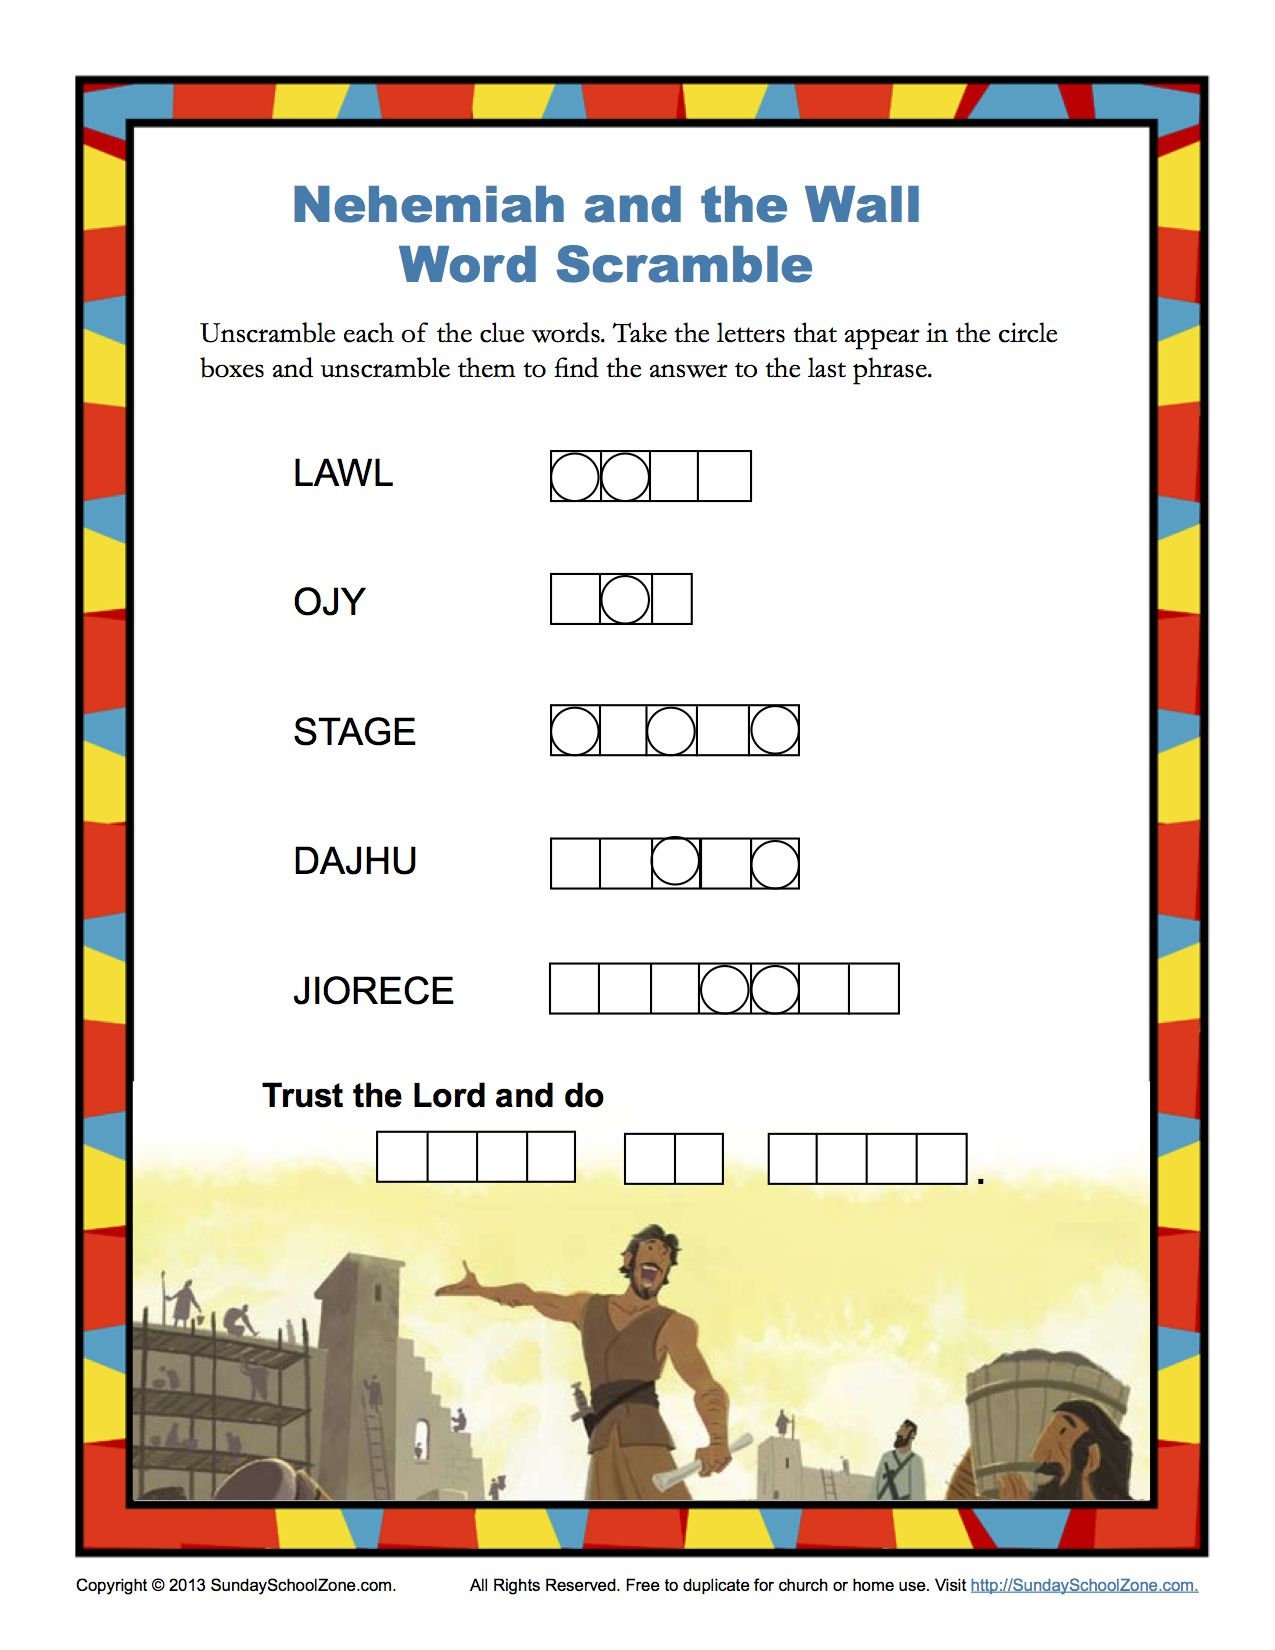 Nehemiah and the Wall Word Scramble